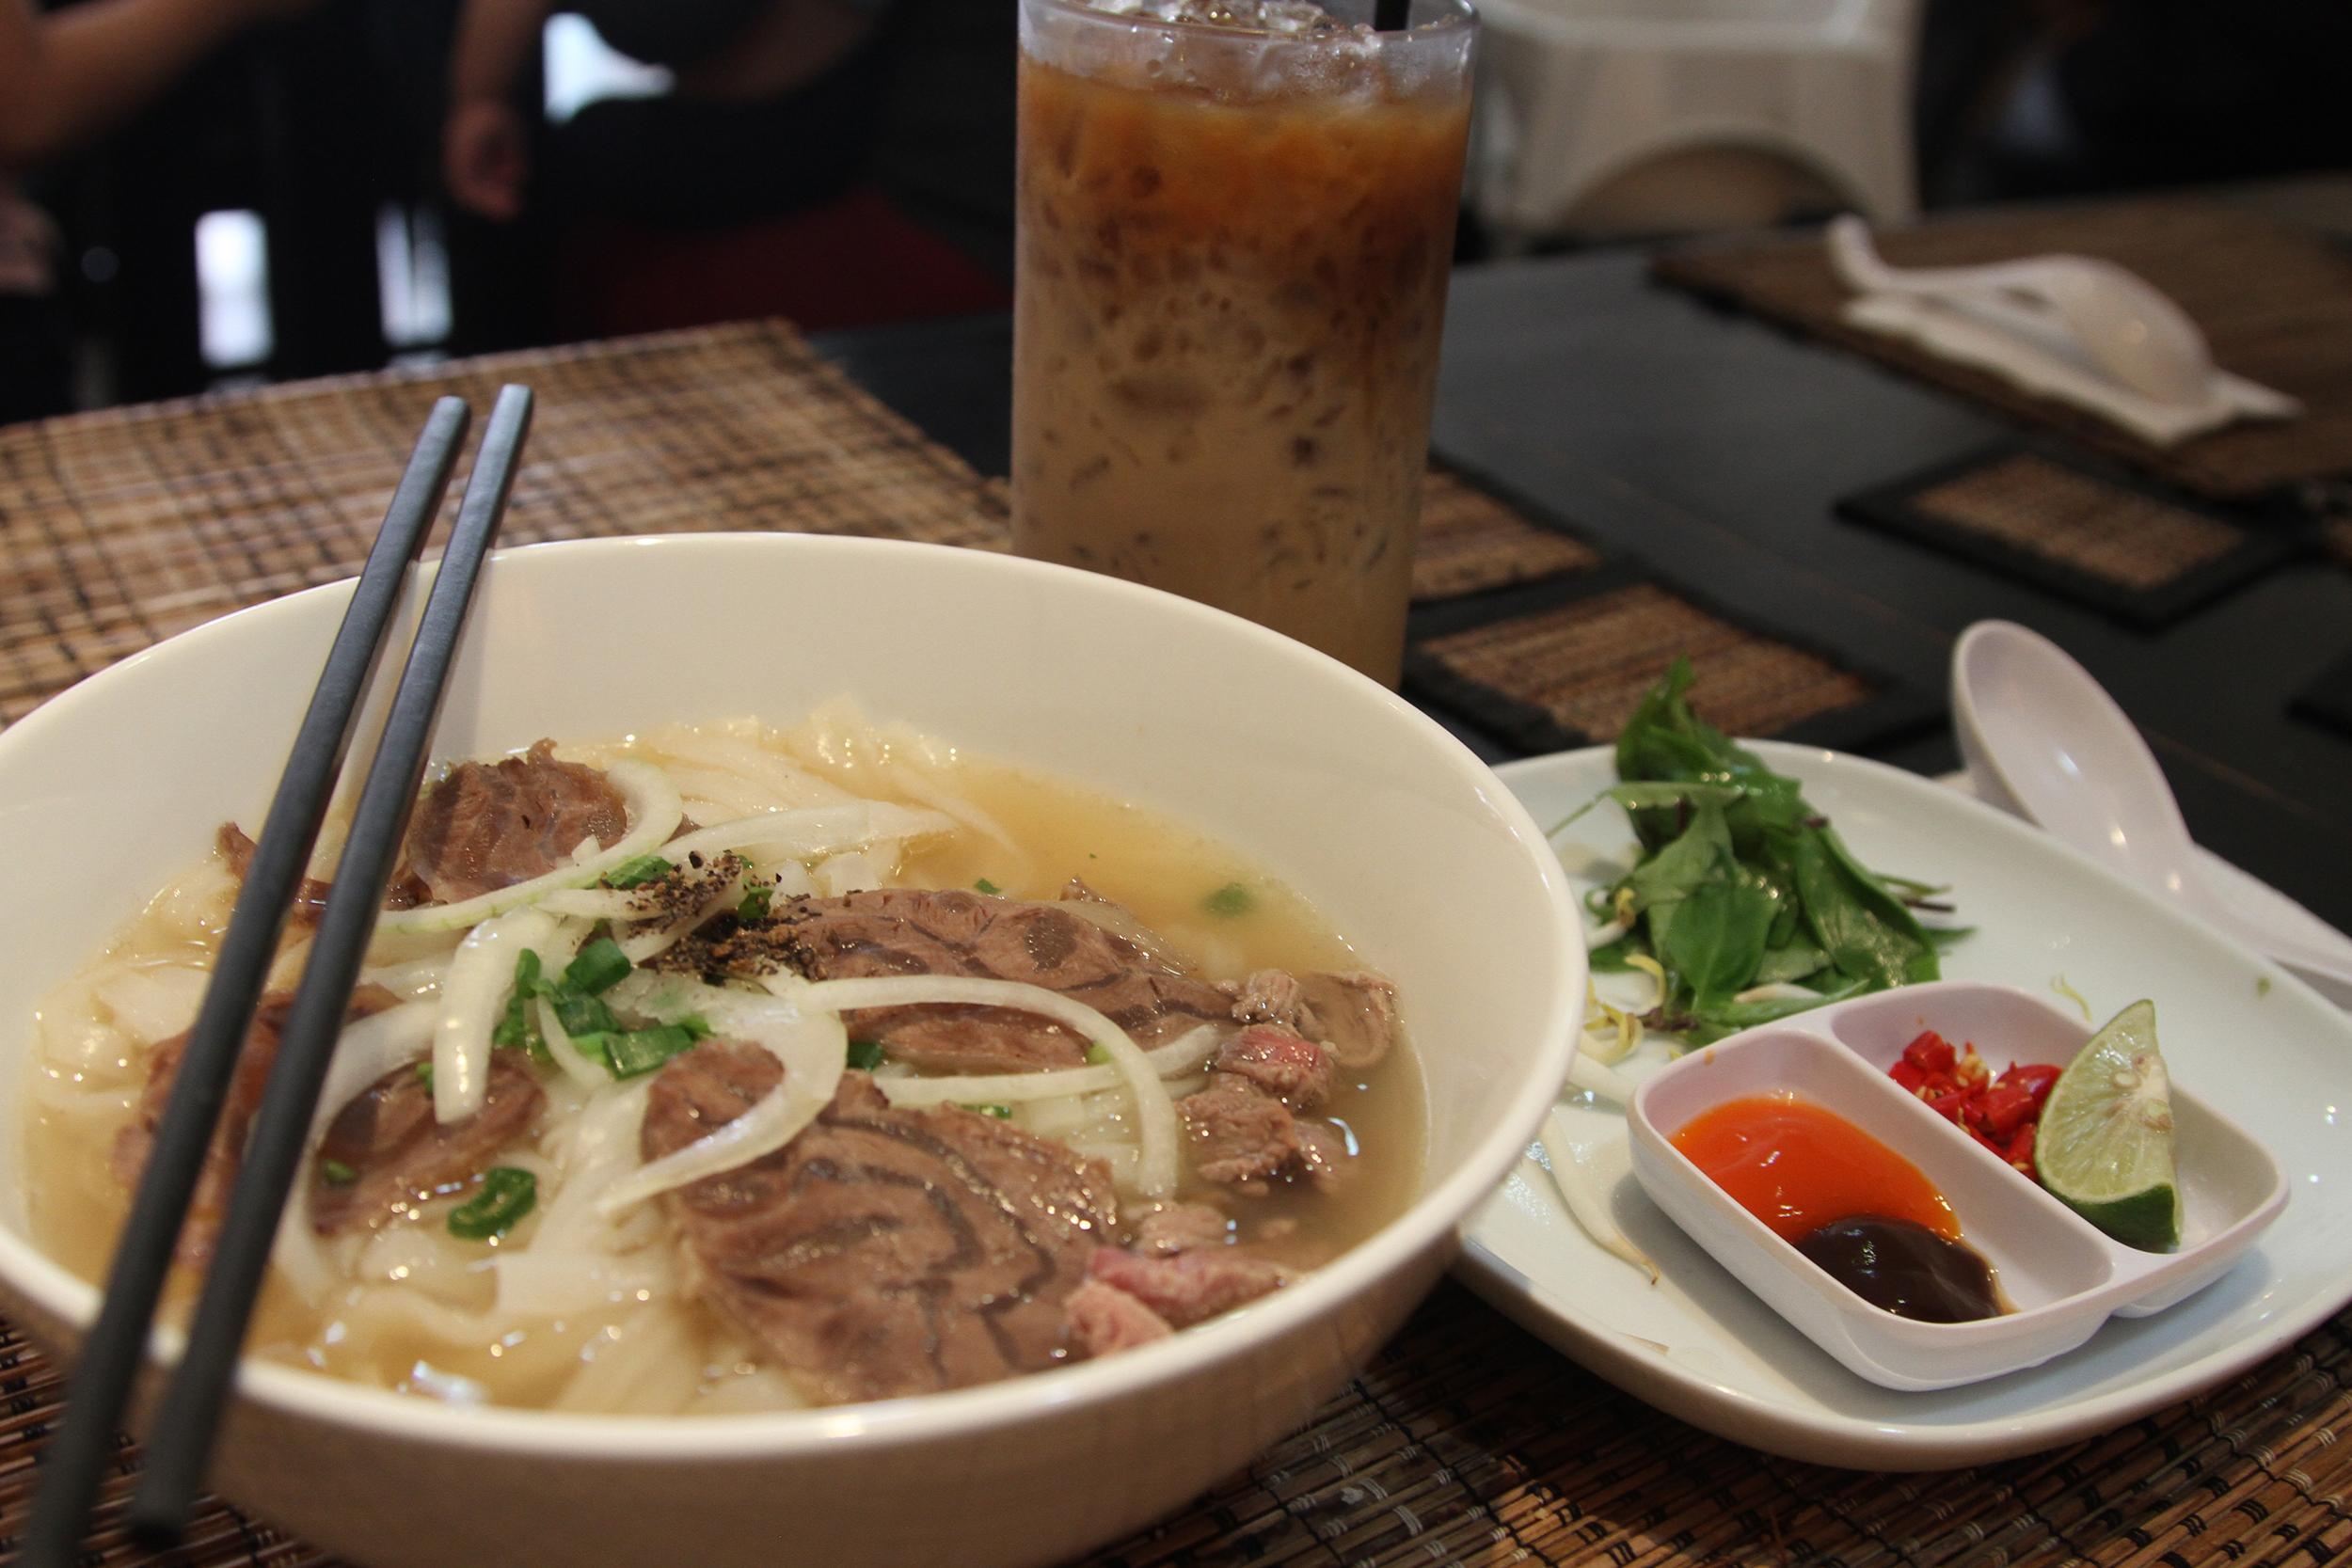 Makan-places-ramadan-venuerific-blog-pho-4-all